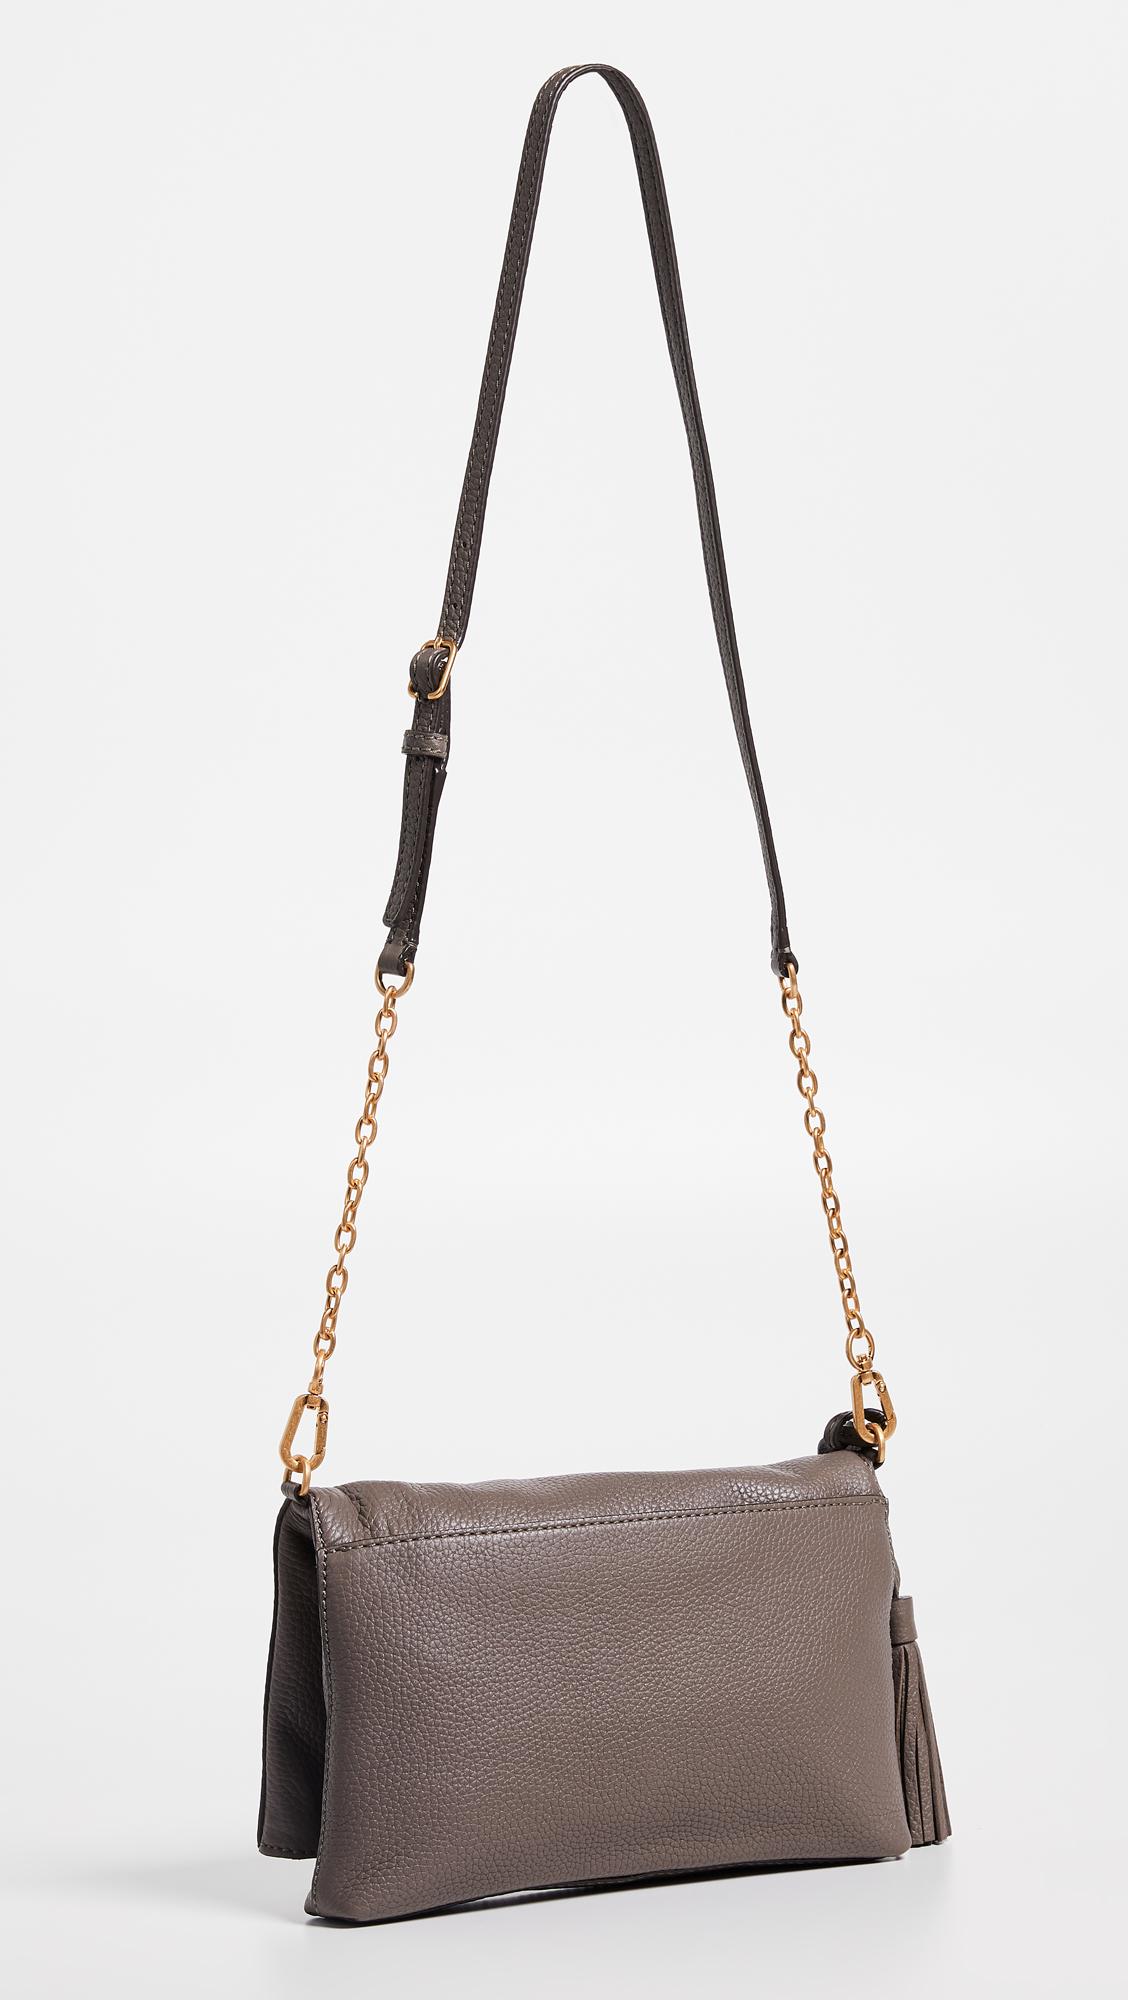 4c0e93b032be Tory Burch Mcgraw Chain Fold-Over Crossbody Bag